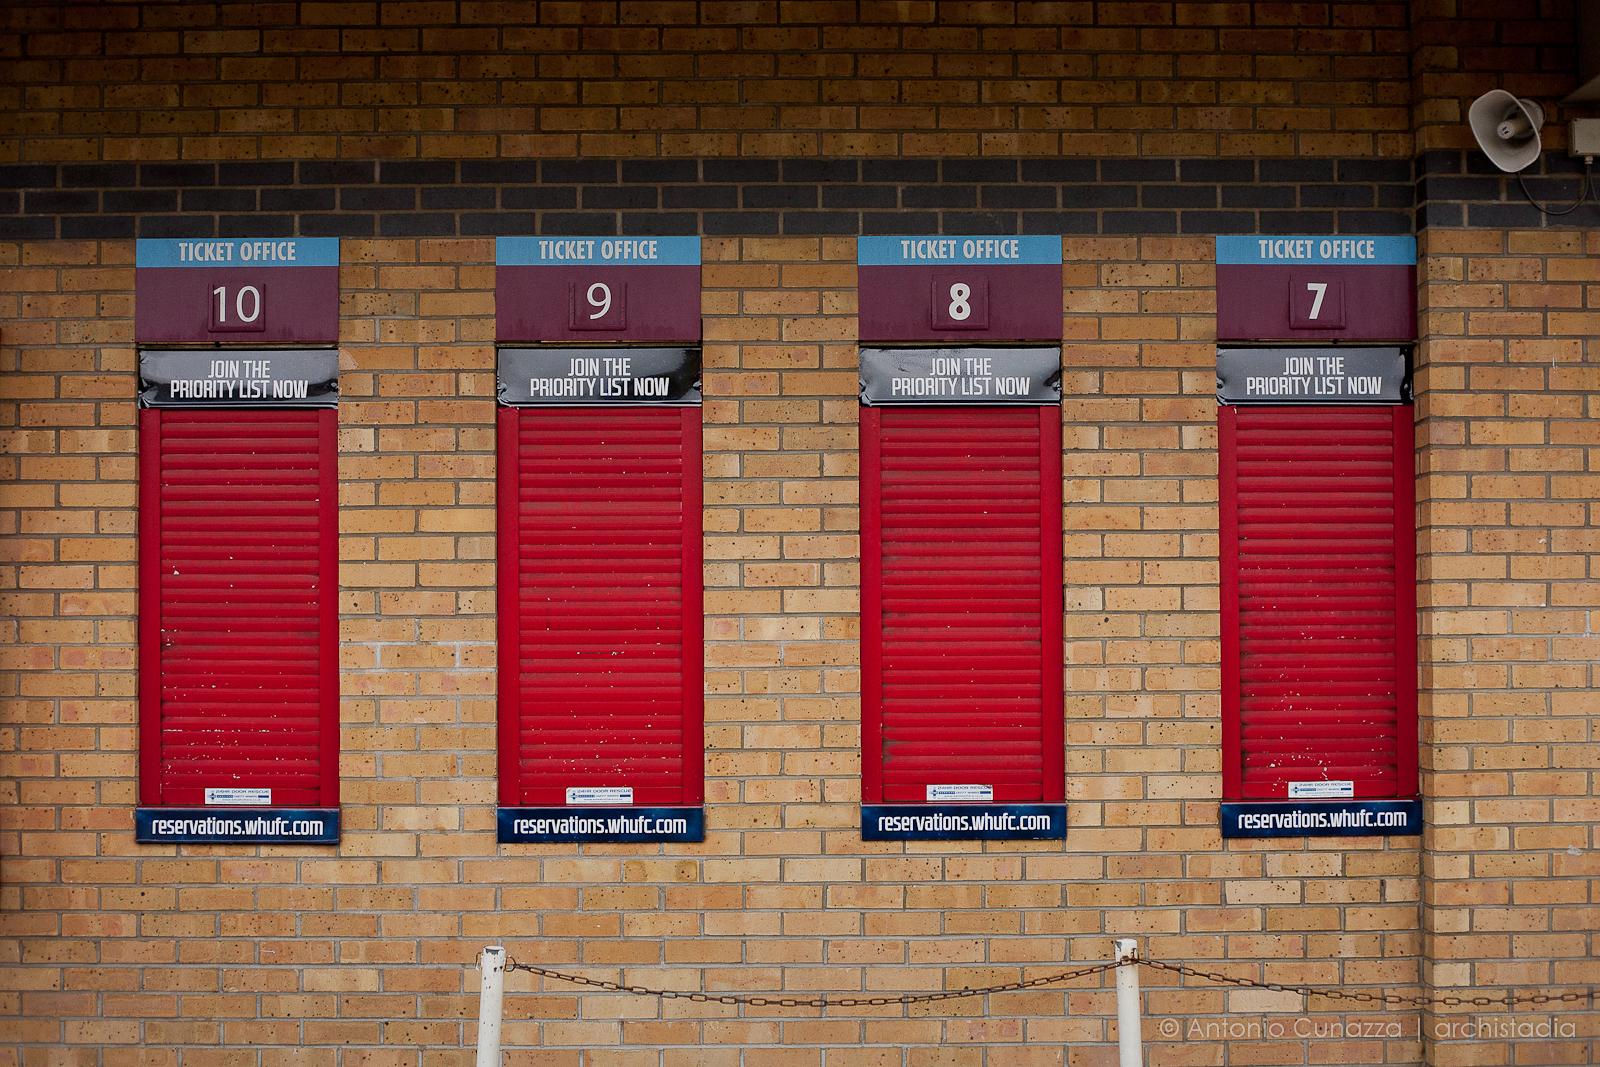 Boleyn Ground Upton Park Londra foto © Antonio Cunazza 2015